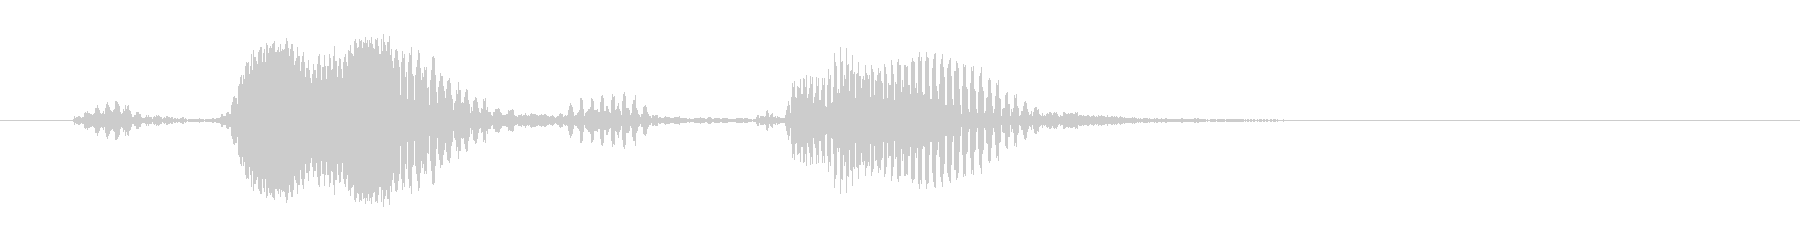 TheDoorsAreClosingの未再生の波形